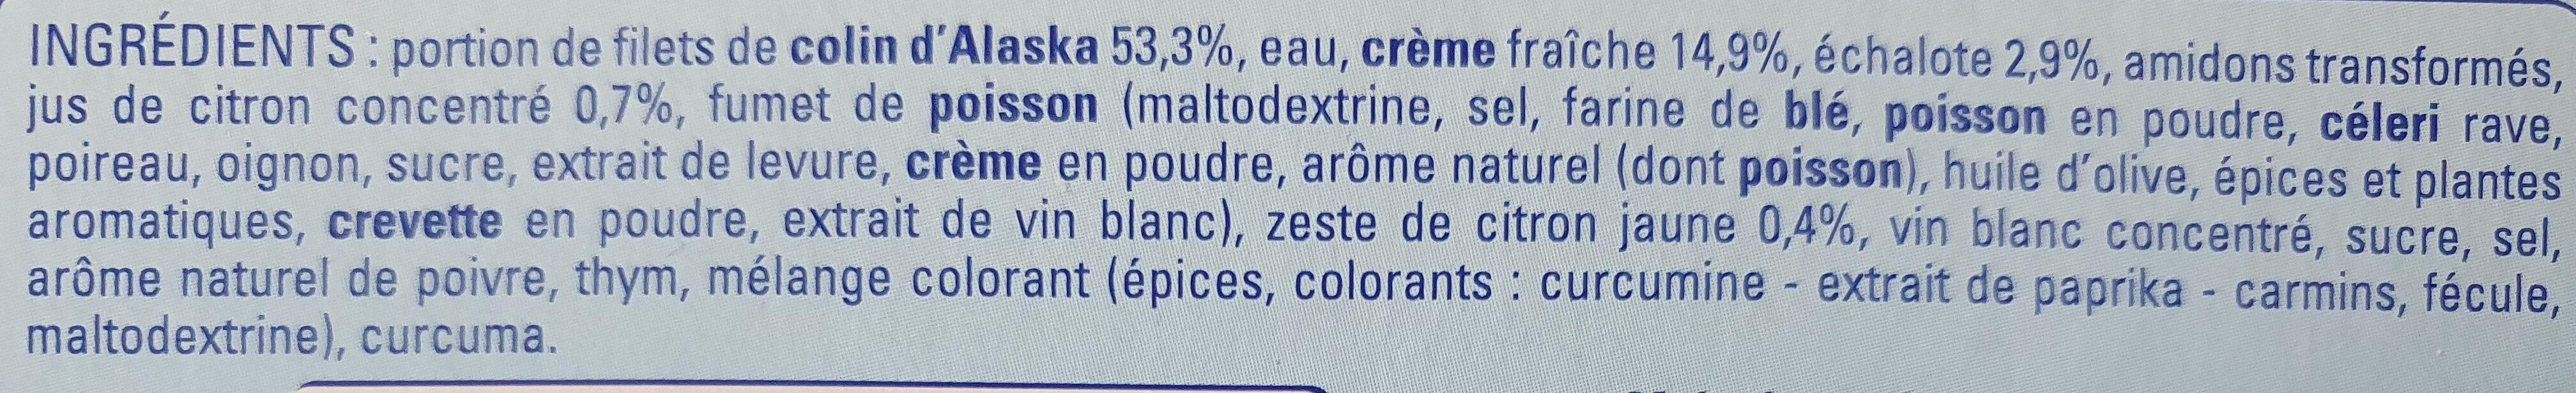 Colin d'Alaska sauce citron - Ingredients - fr